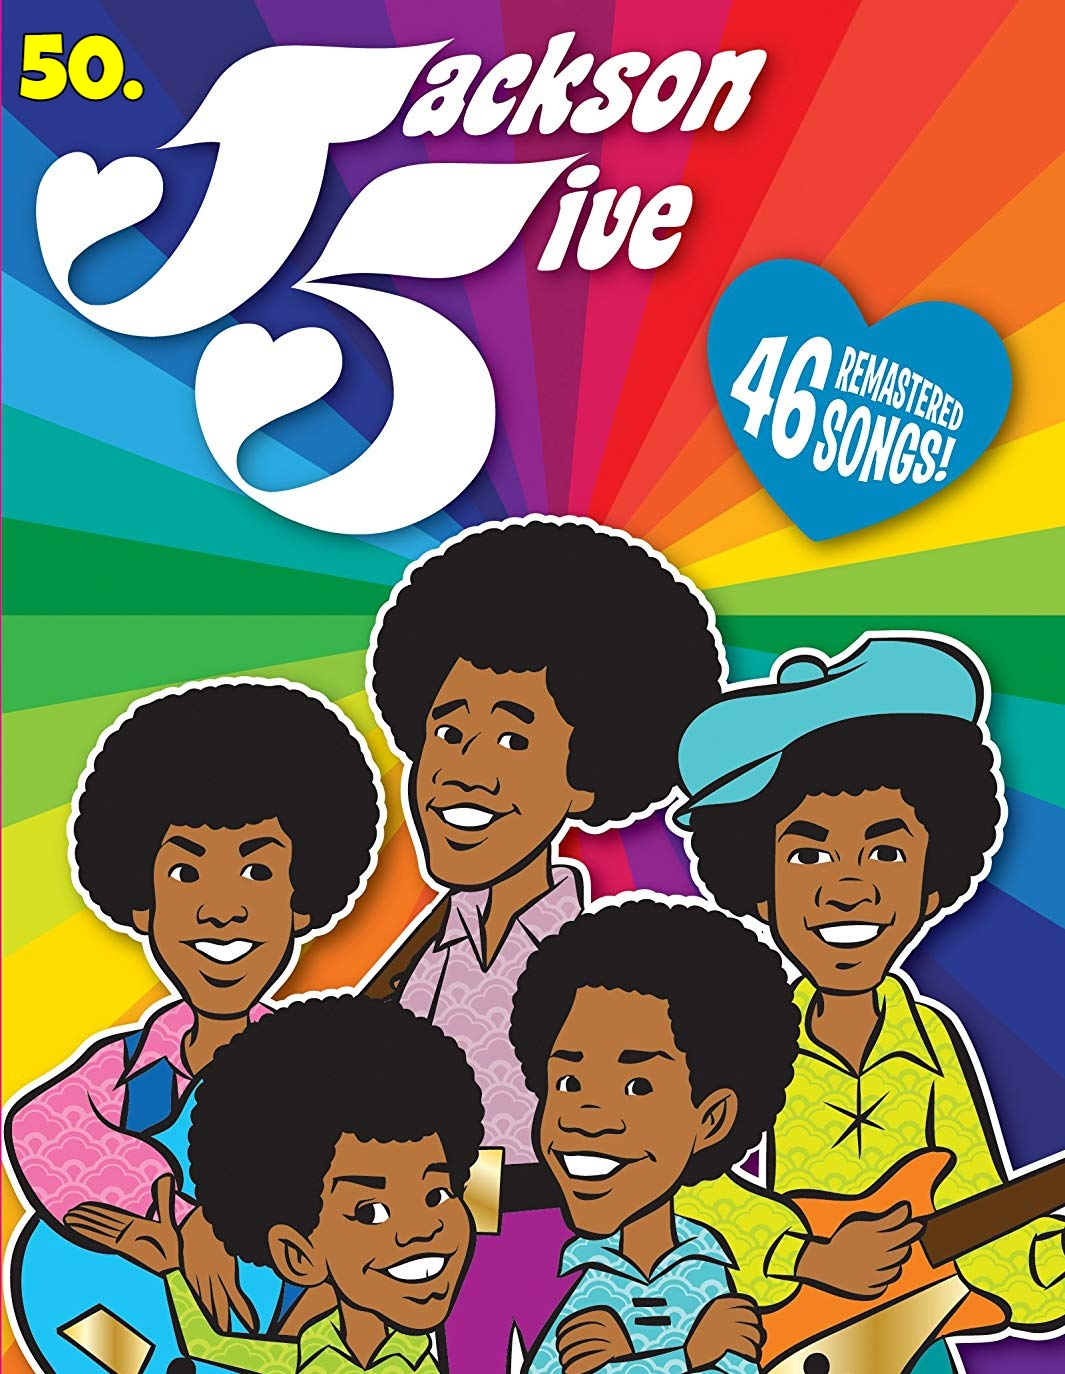 The Jackson 5ive